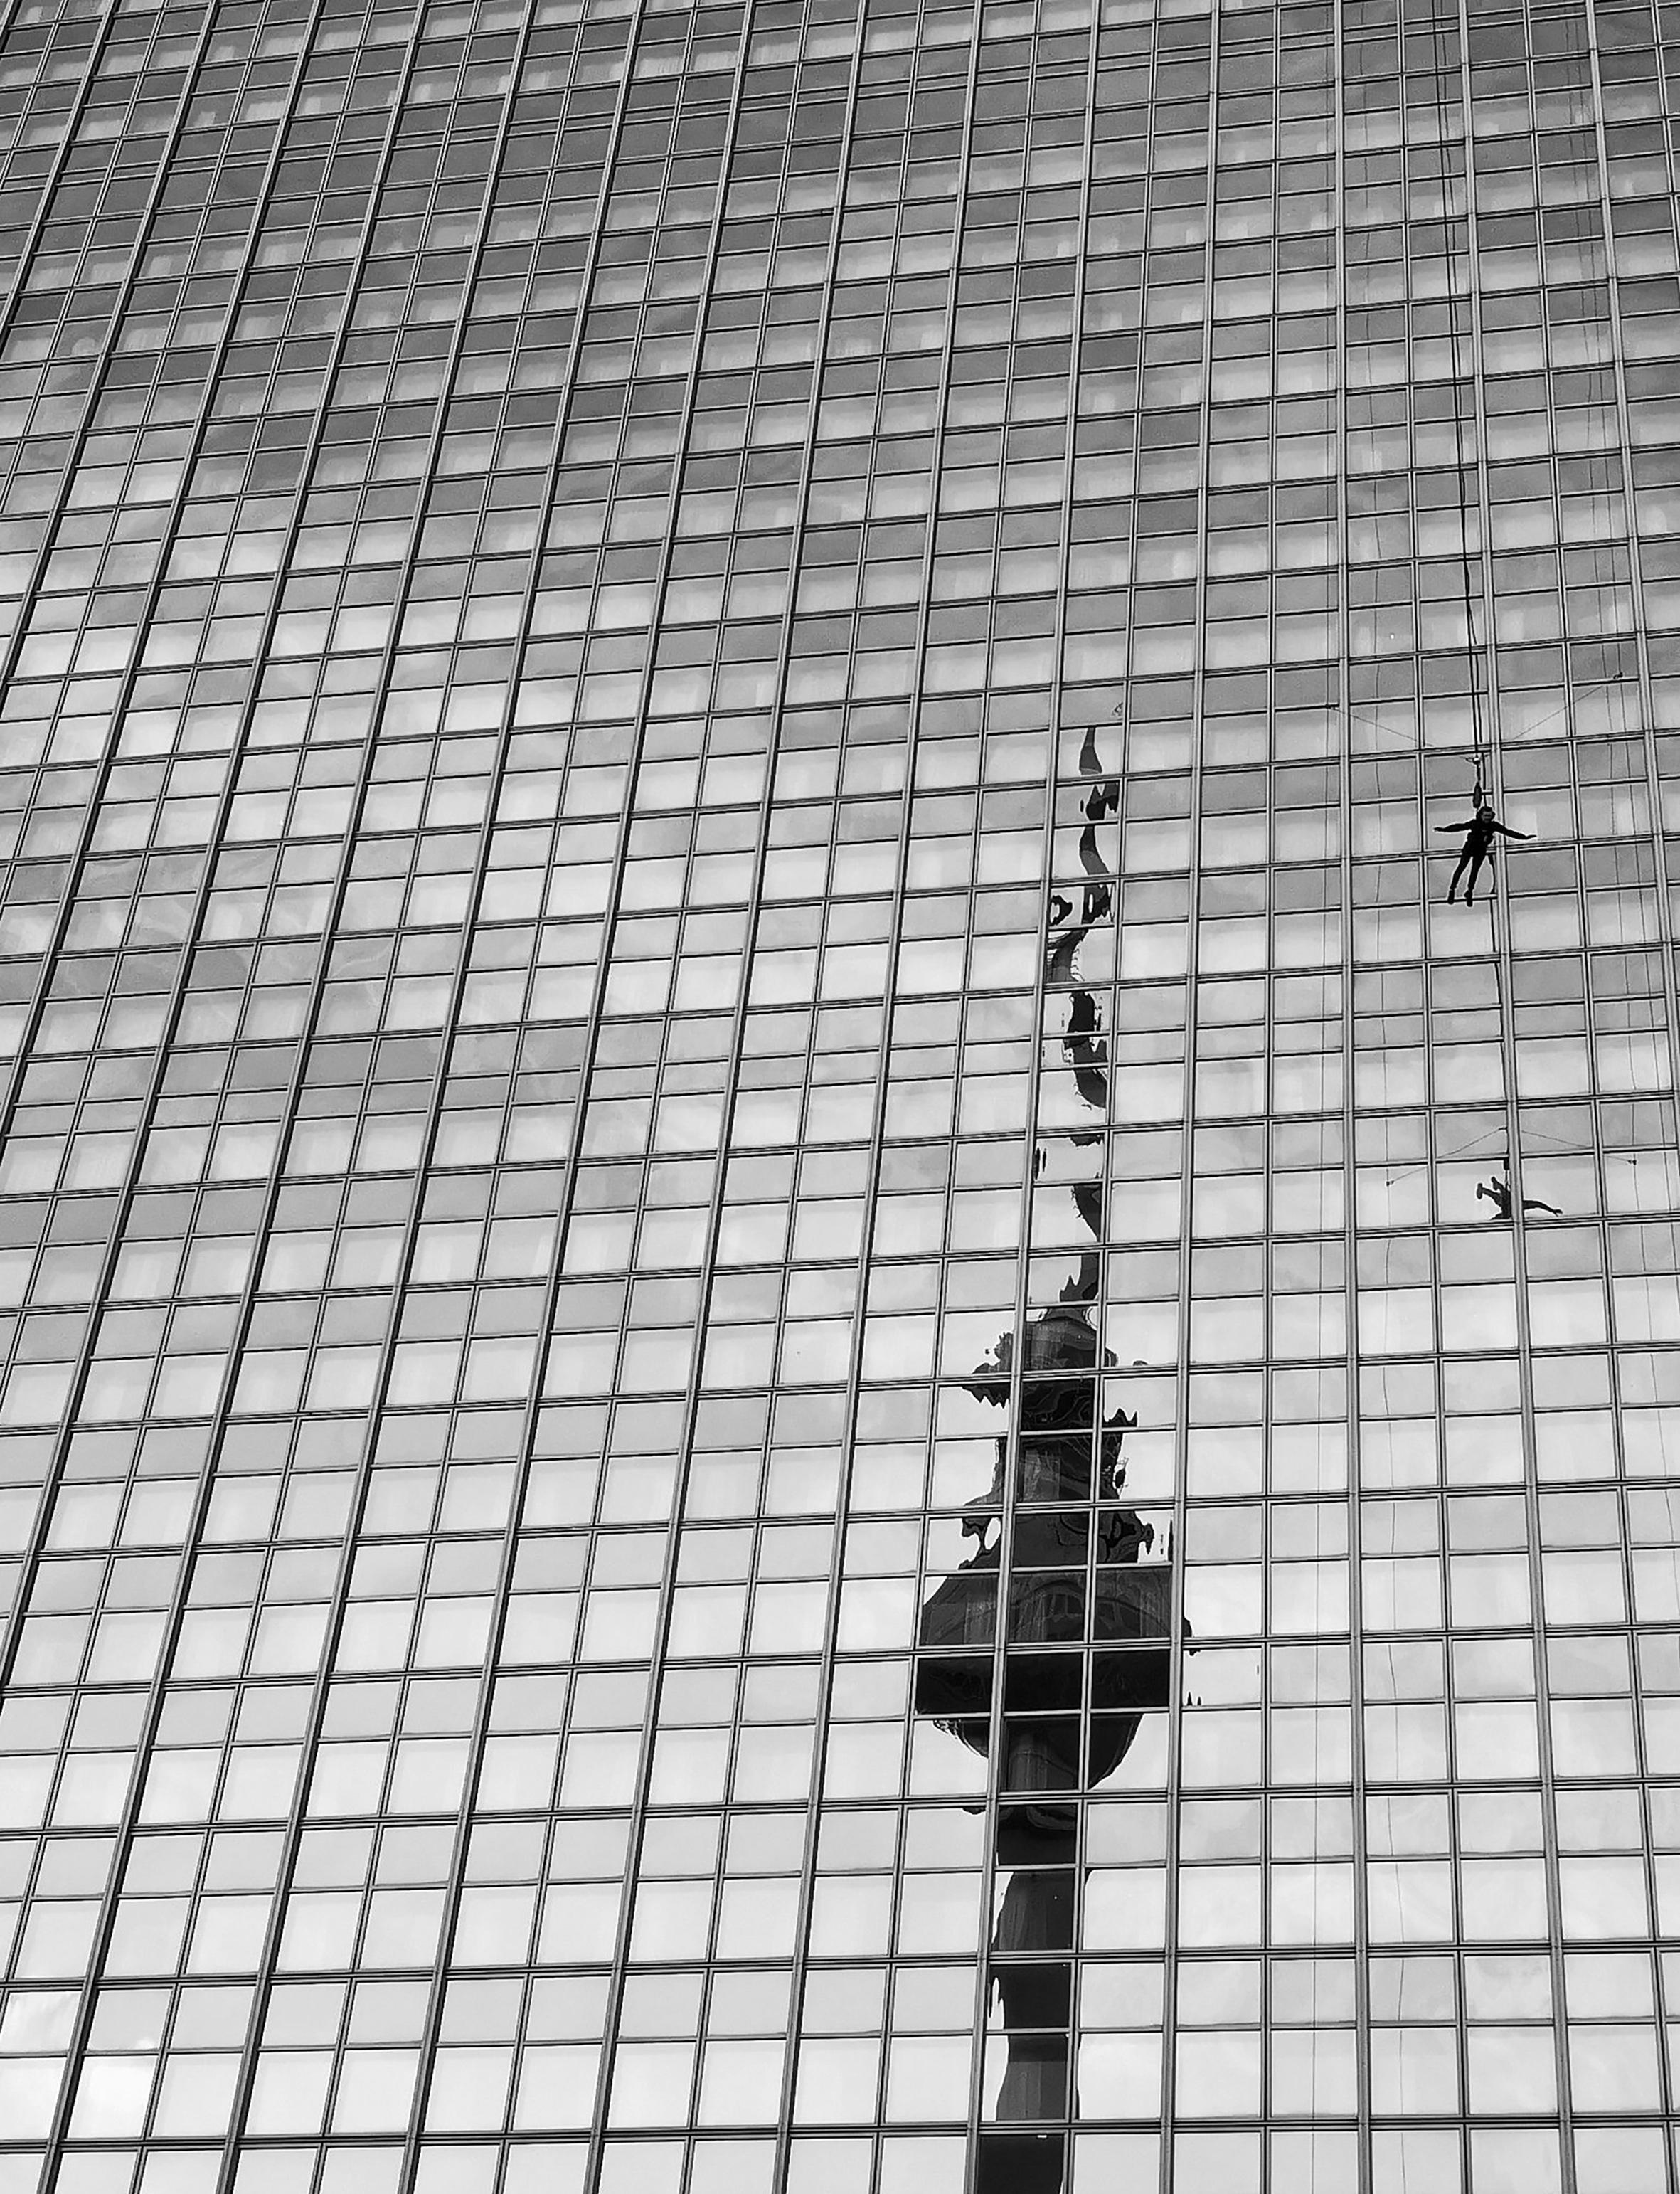 Metropolis #118, Alexanderplatz, 2019/10/21, Silbergelatine Abzug / silver gelatin print, Printed 2021, Copyright Barbara Wolff